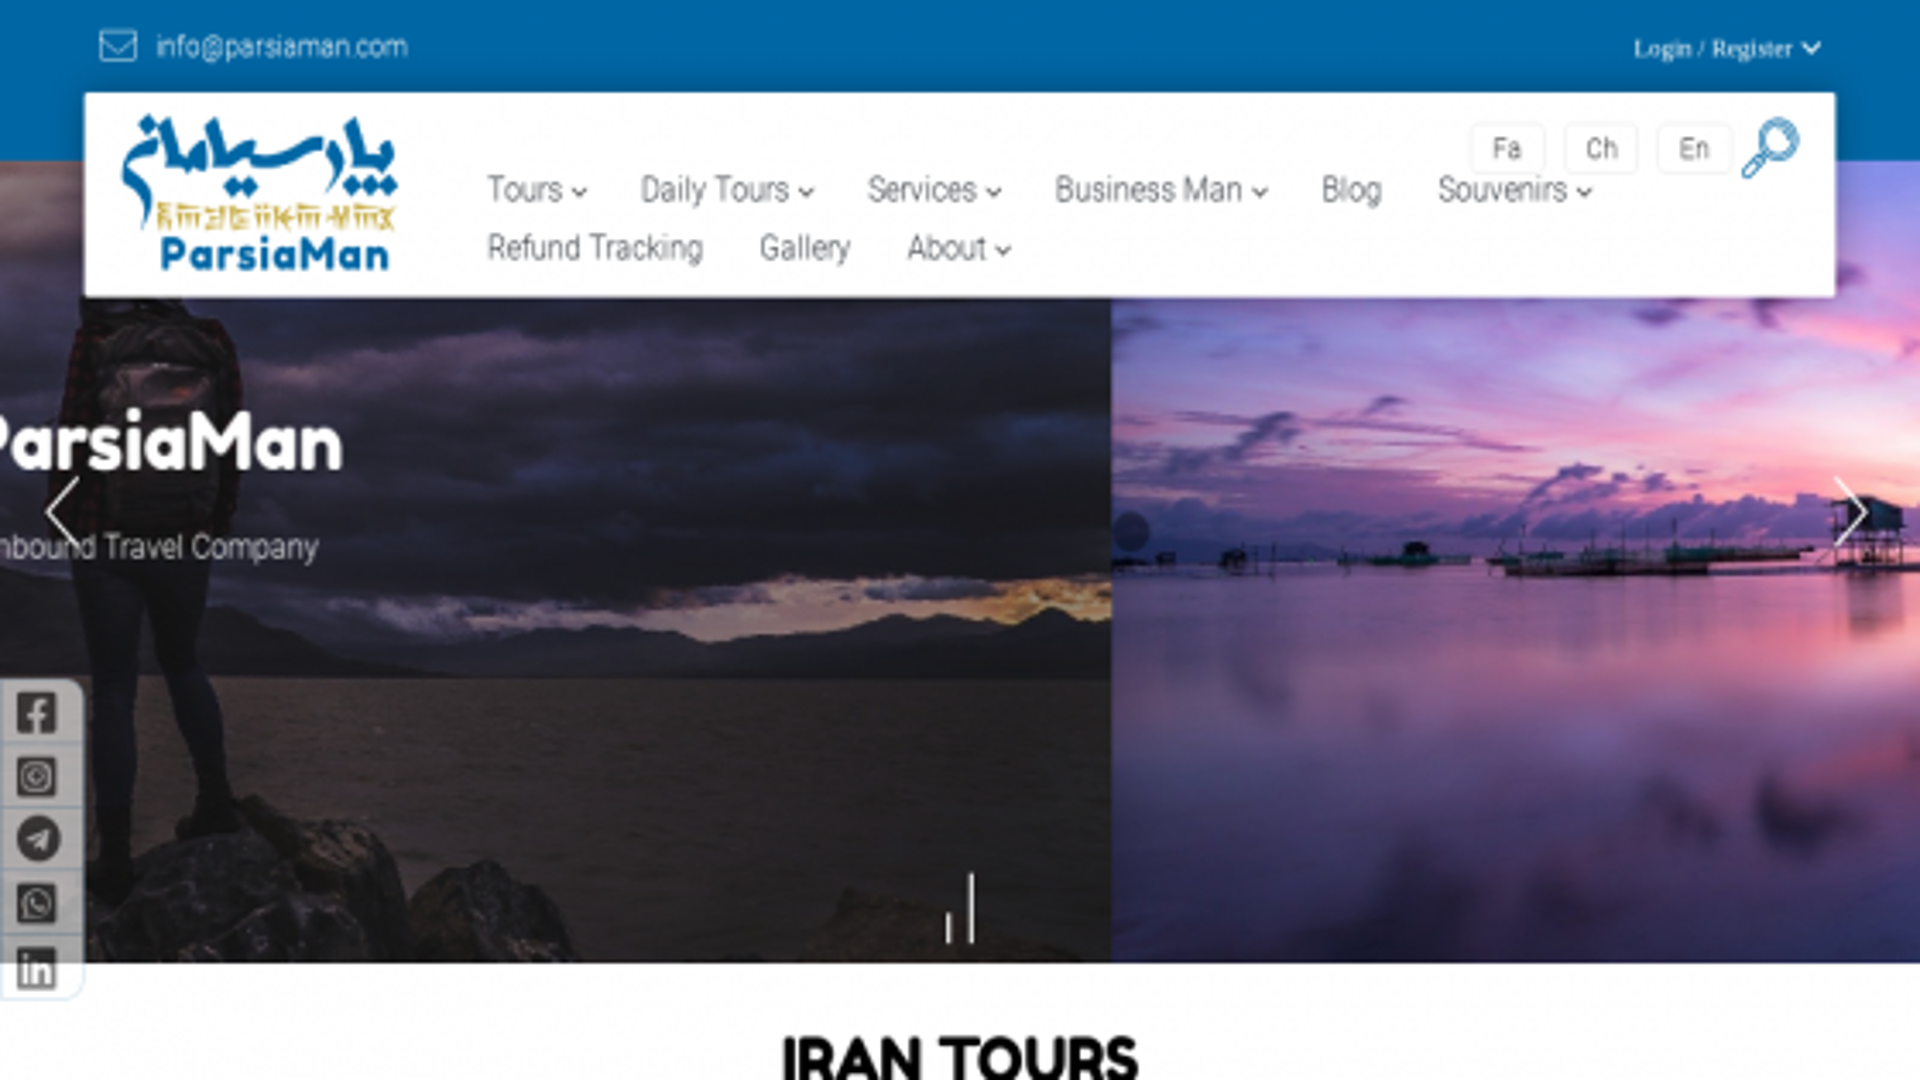 طراحی سايت آژانس مسافرتی پارسیامان سفر پایدار